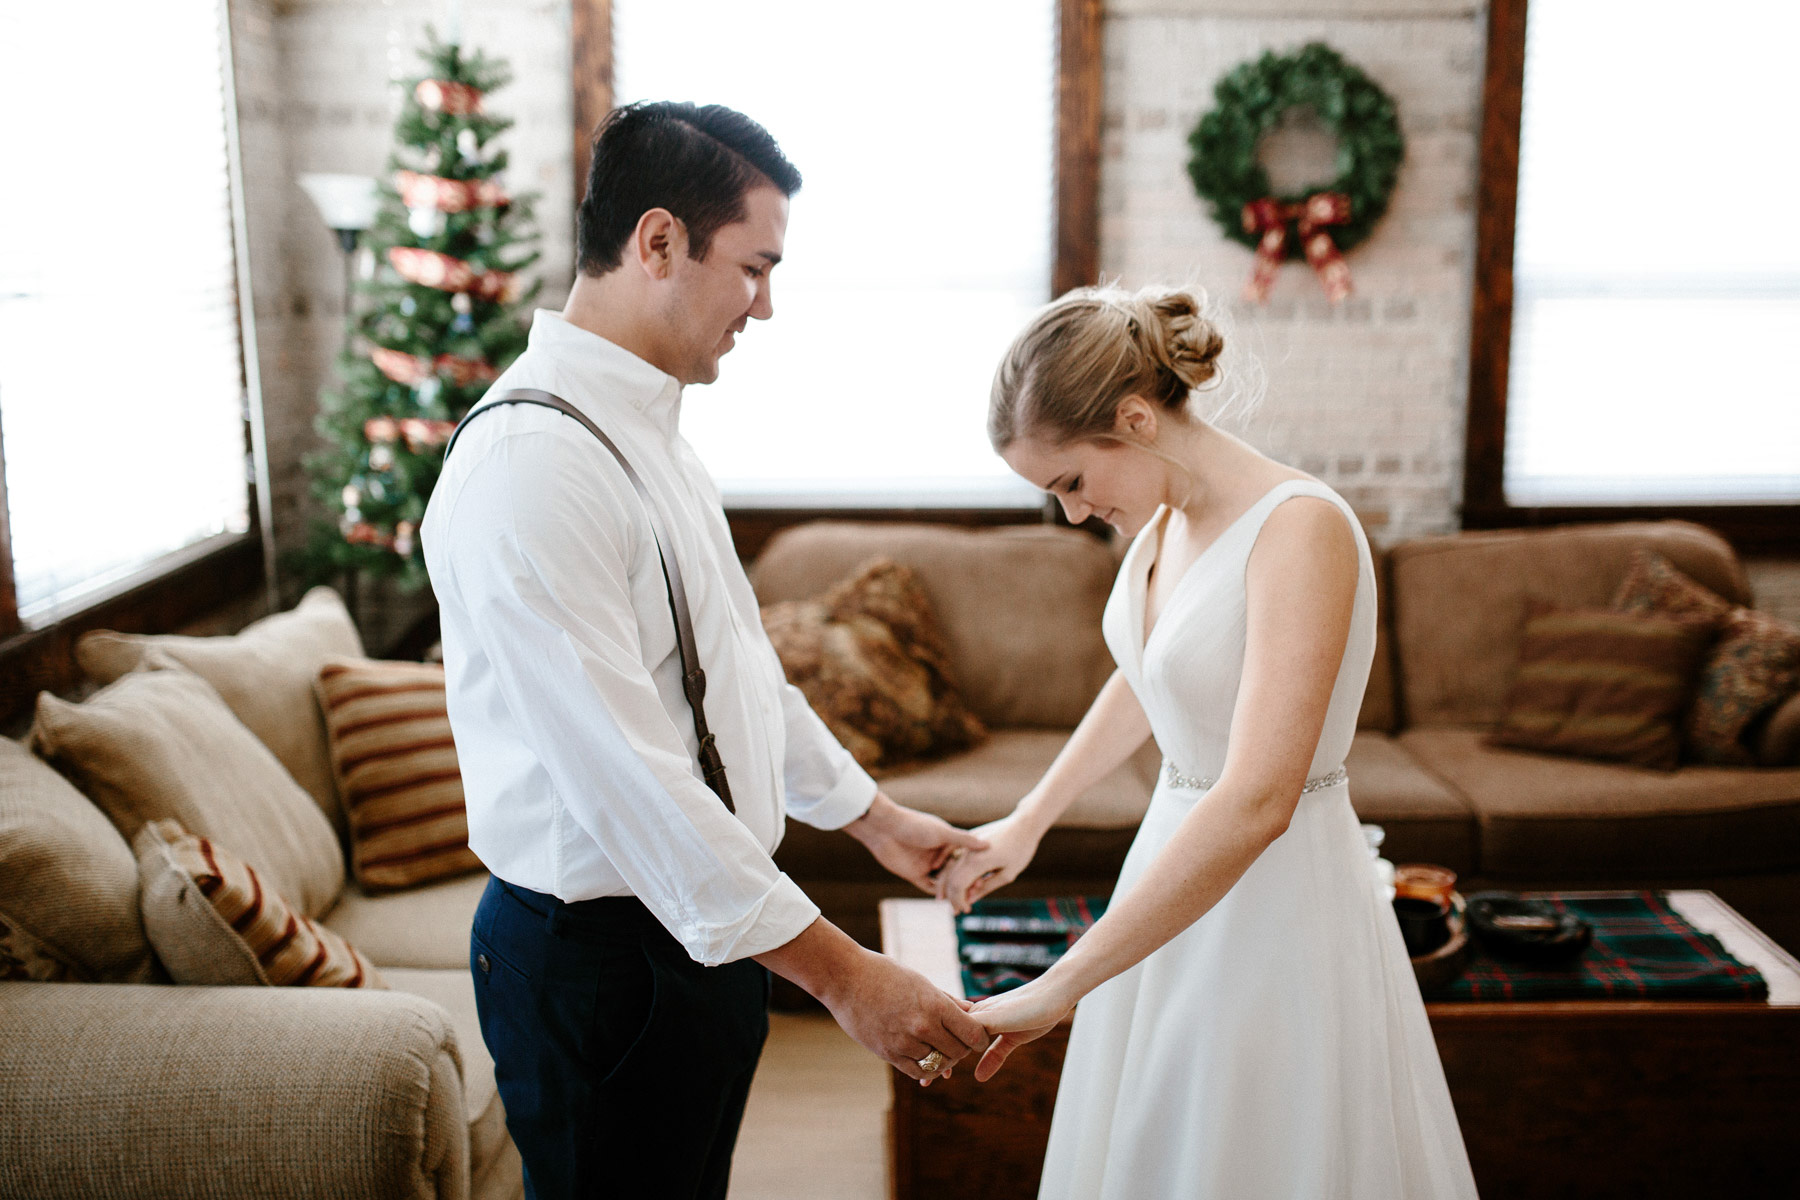 sioux-falls-black-hills-rapid-city-elopement-wedding-adventure-photographer-custer-sylvan-lake-18.jpg